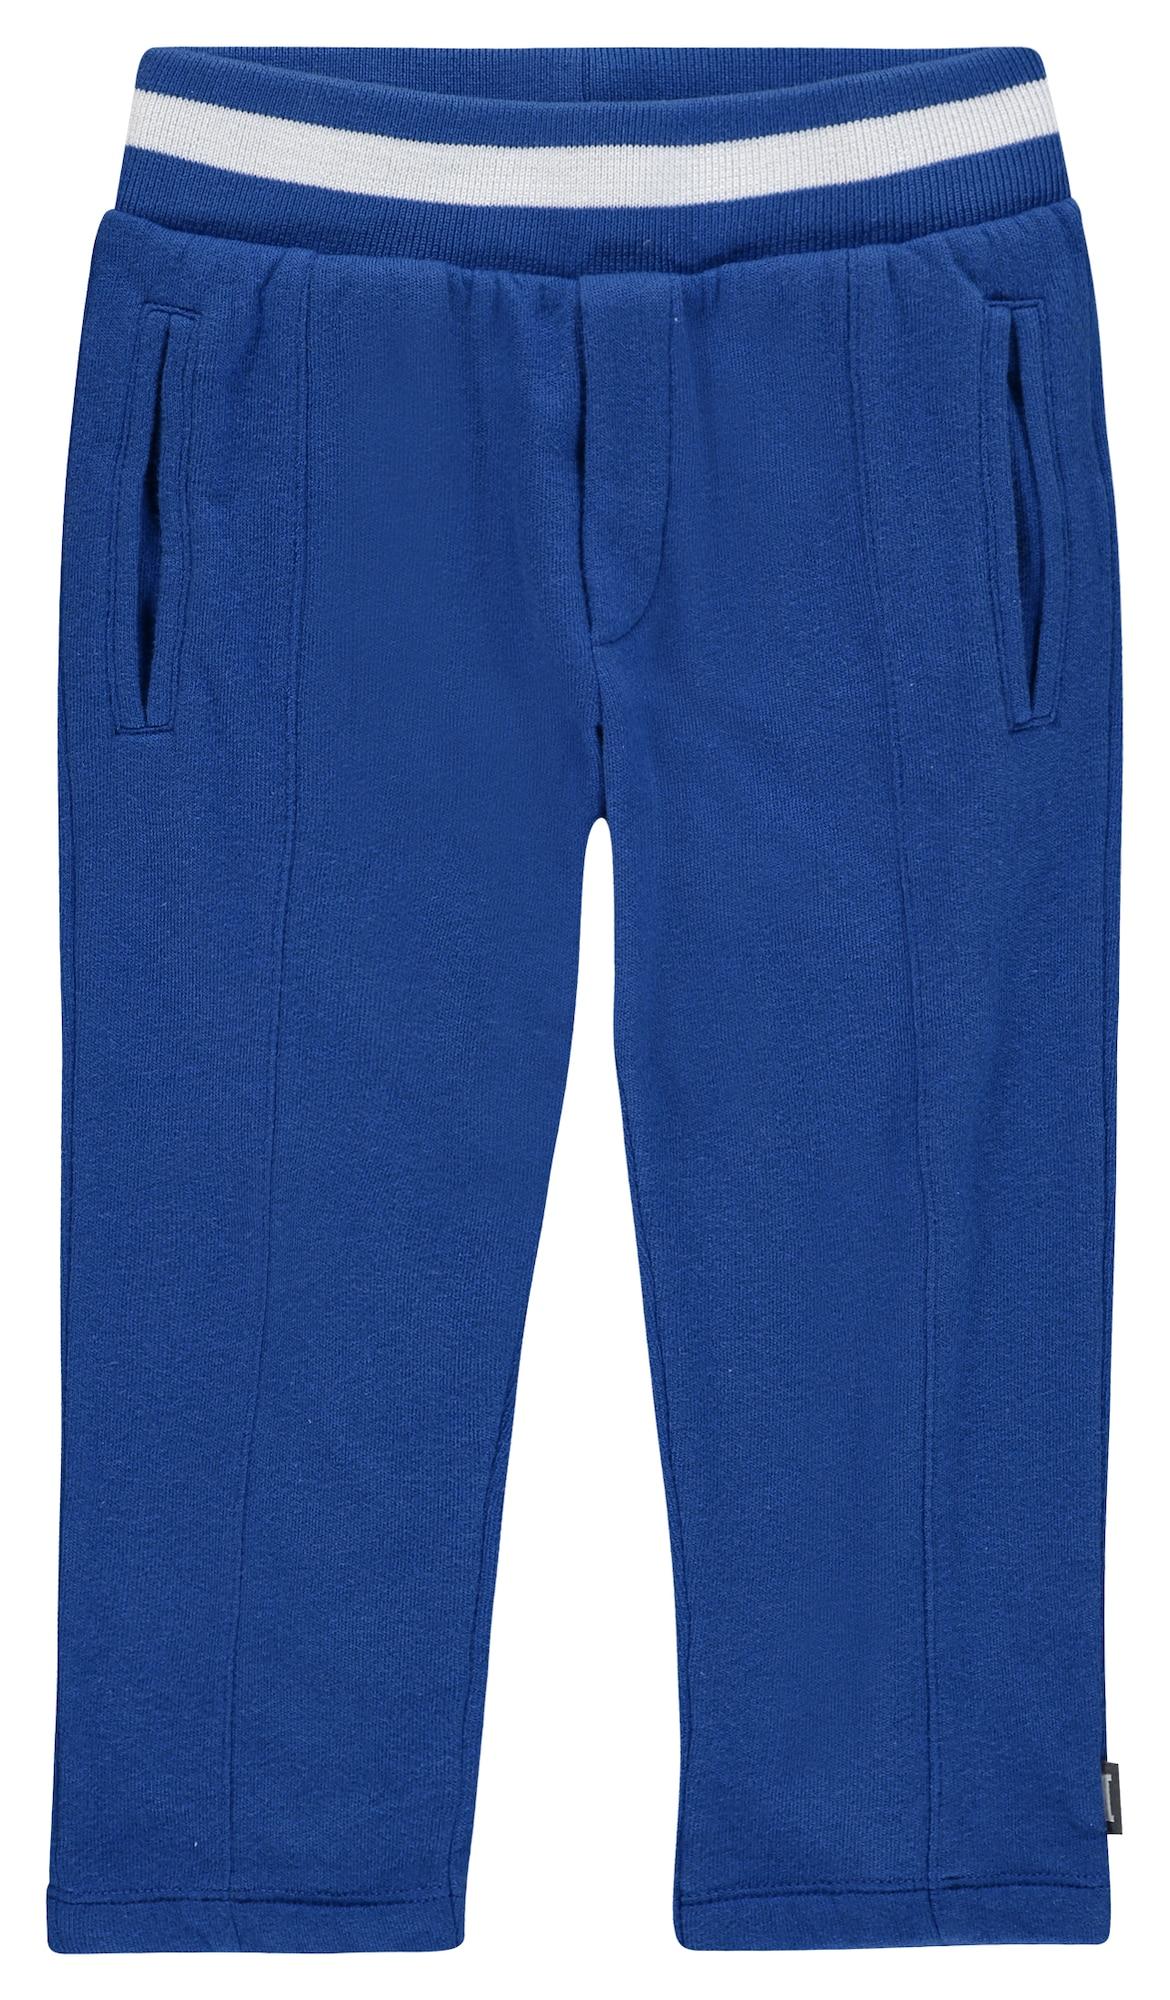 Miniboyhosen - Jogginghose 'Glendale' - Onlineshop ABOUT YOU